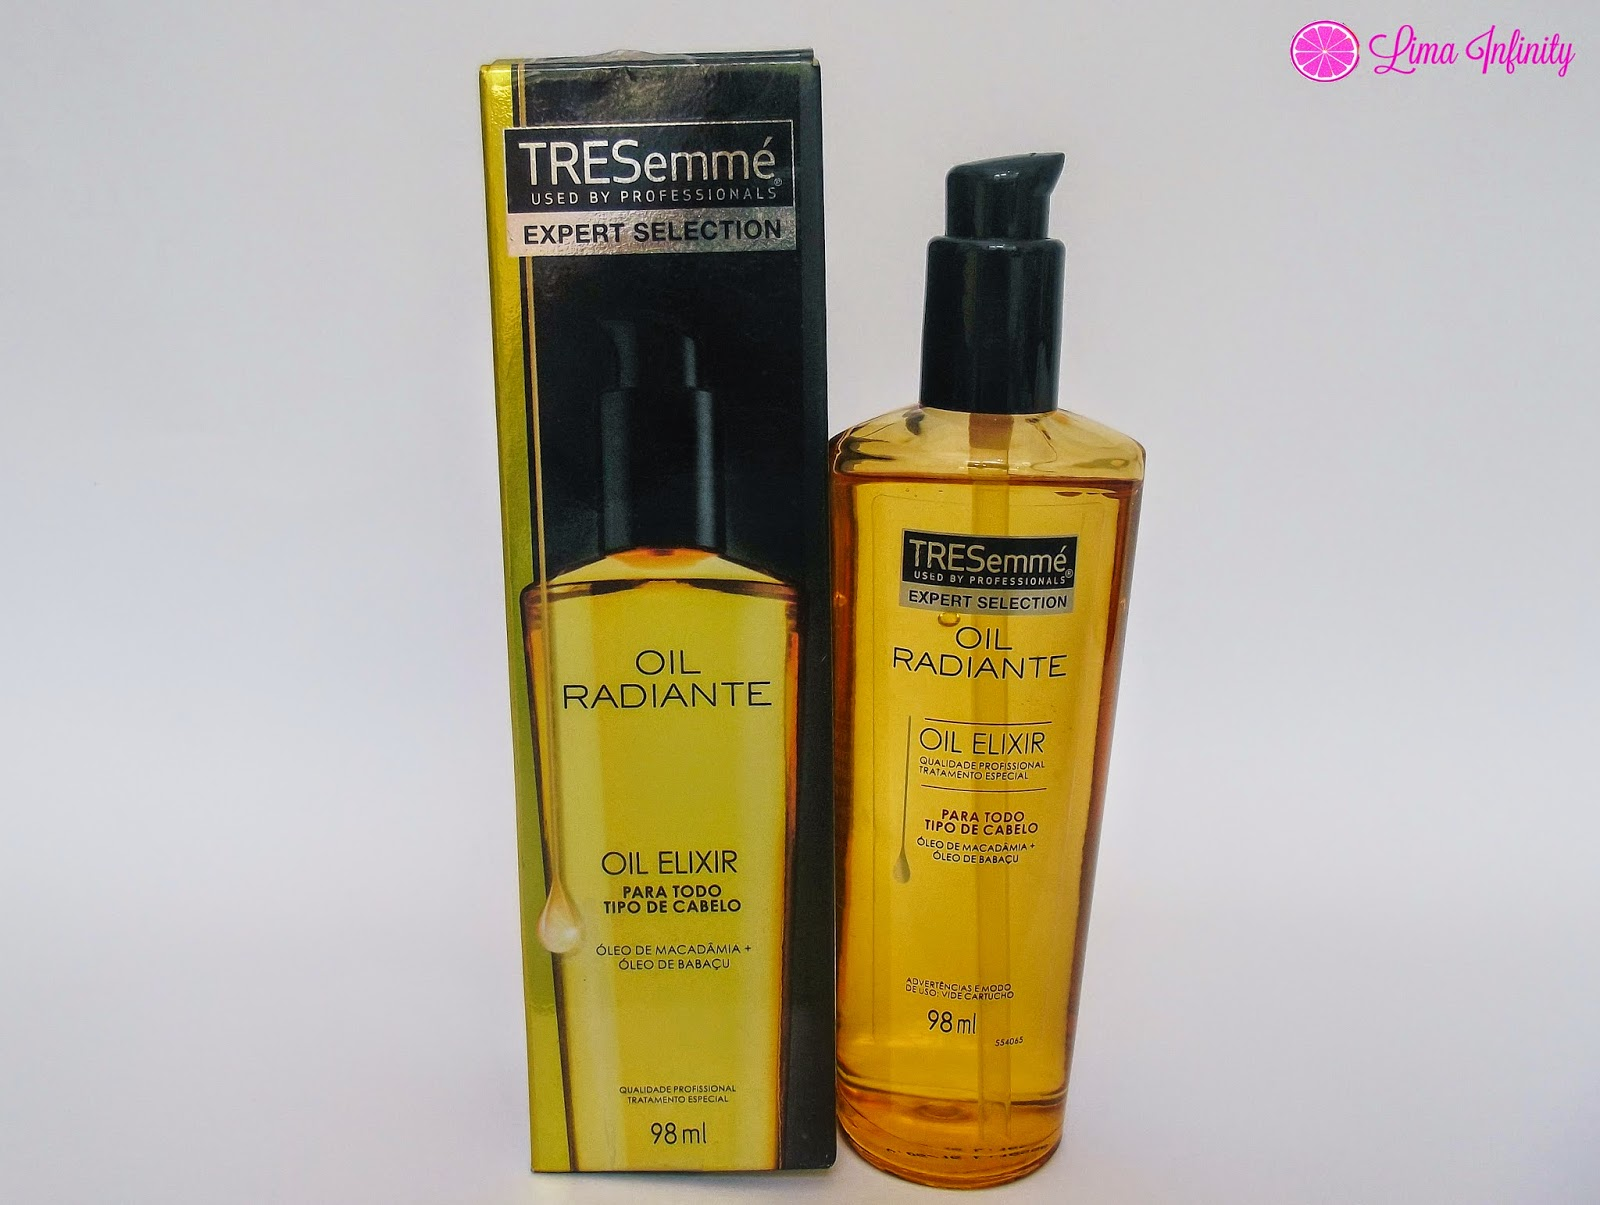 óleo-tresemmé-para-todo-tipo-de-cabelo-babaçu-macadâmia